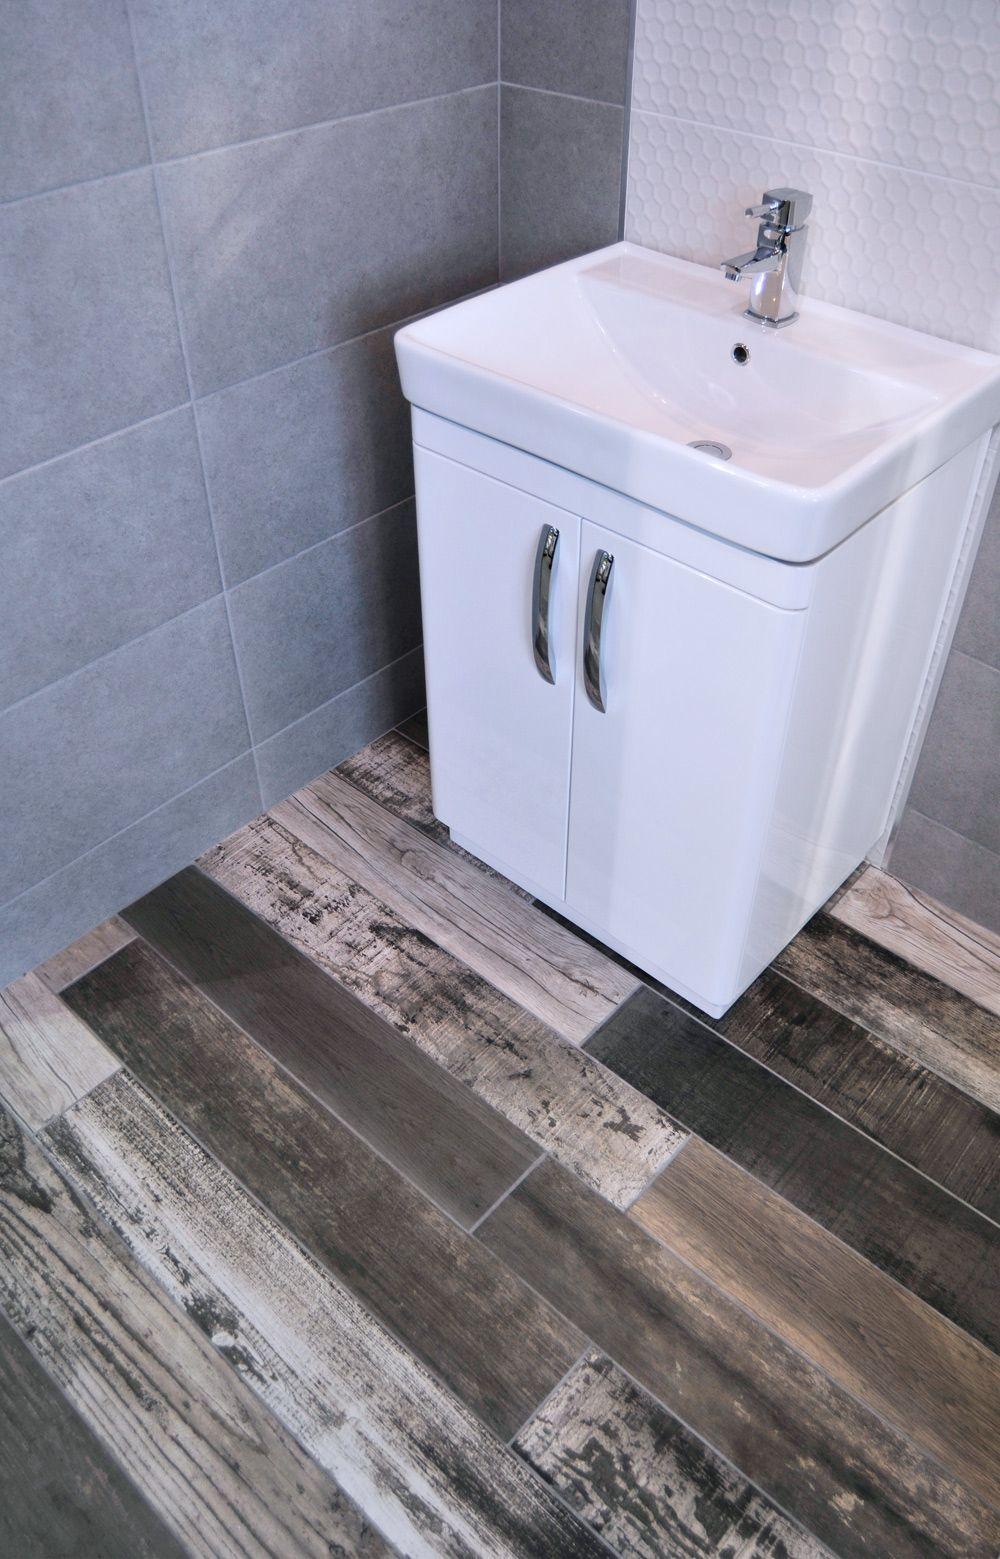 Samba multi wood 15x90cm porcelain floor tile by yurtbay brooke samba multi wood 15x90cm porcelain floor tile by yurtbay brooke ceramics dailygadgetfo Gallery